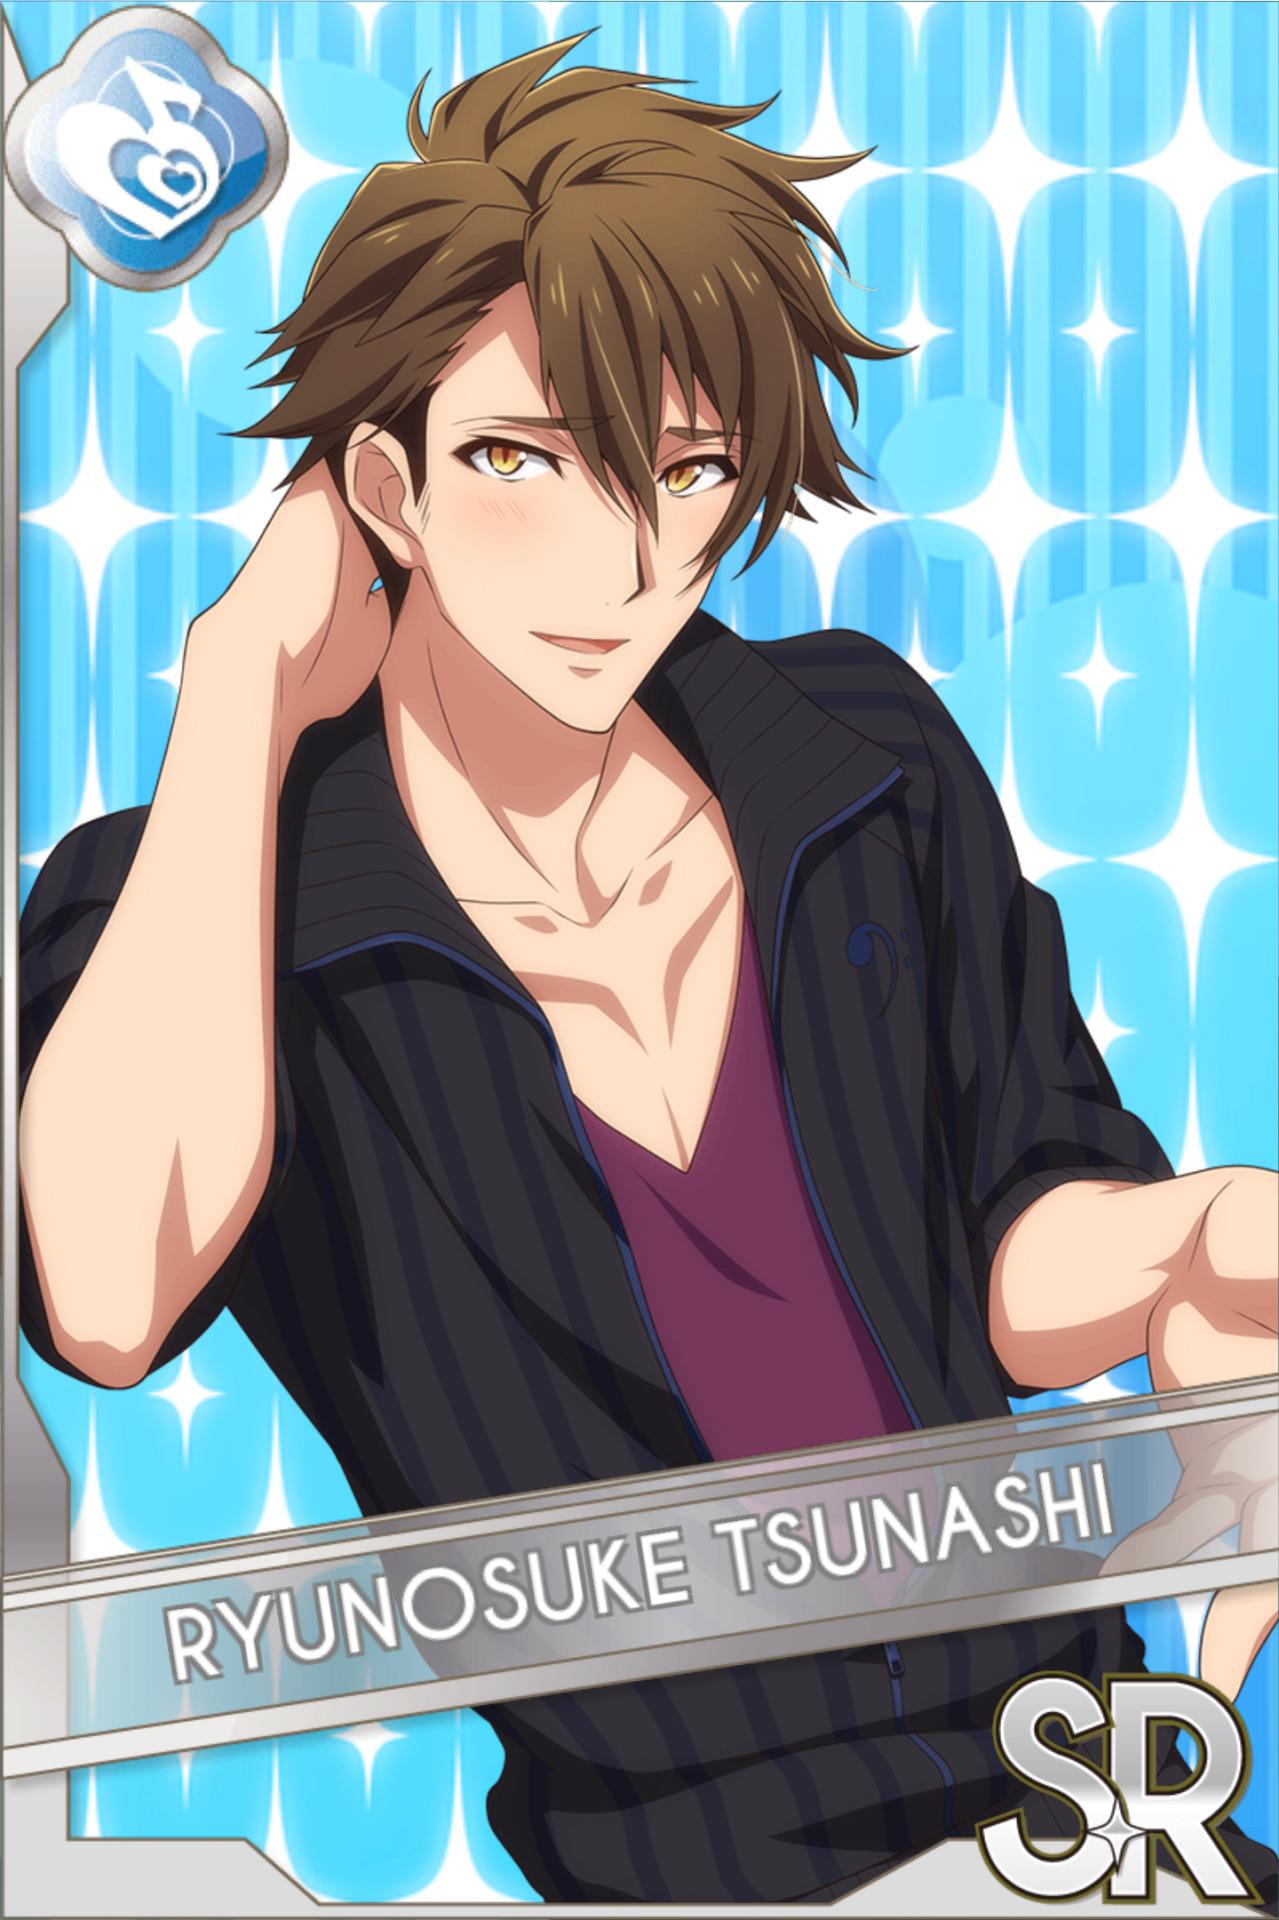 Ryunosuke Tsunashi (Rabbit Ears Parka)